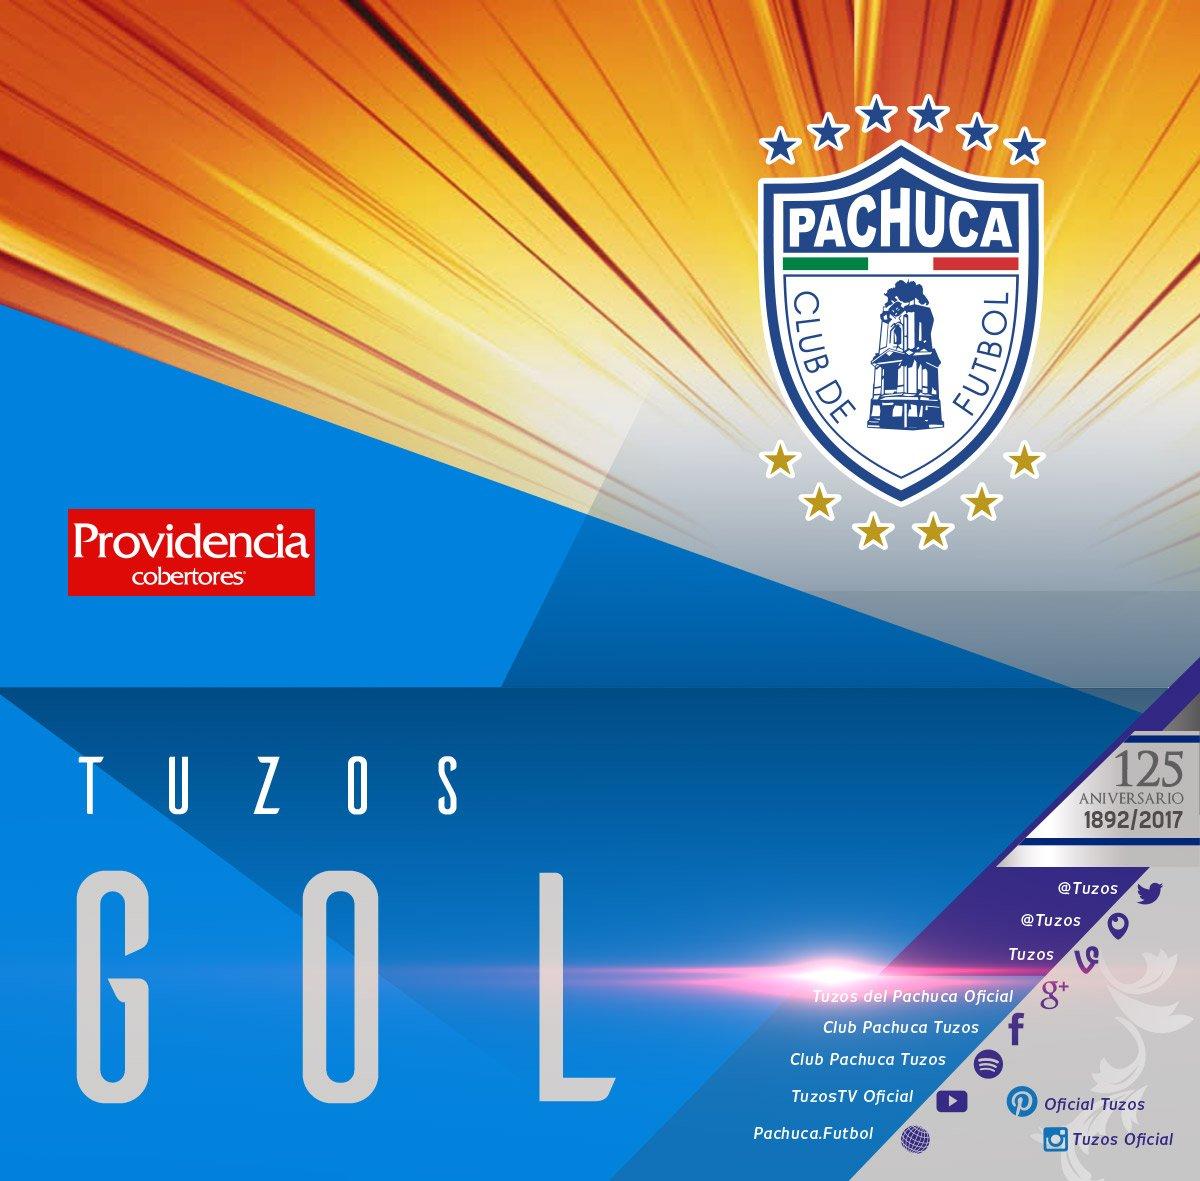 04´1T @Tuzos 1-0 @Atlante GOOOOOOOOOOOOOOOOOOOL DE PACHUCA, Anotado por @Omar4Gonzalez   #Semifinal @LaCopaMX   💙@providenciacob#ElÚnicoEnMi